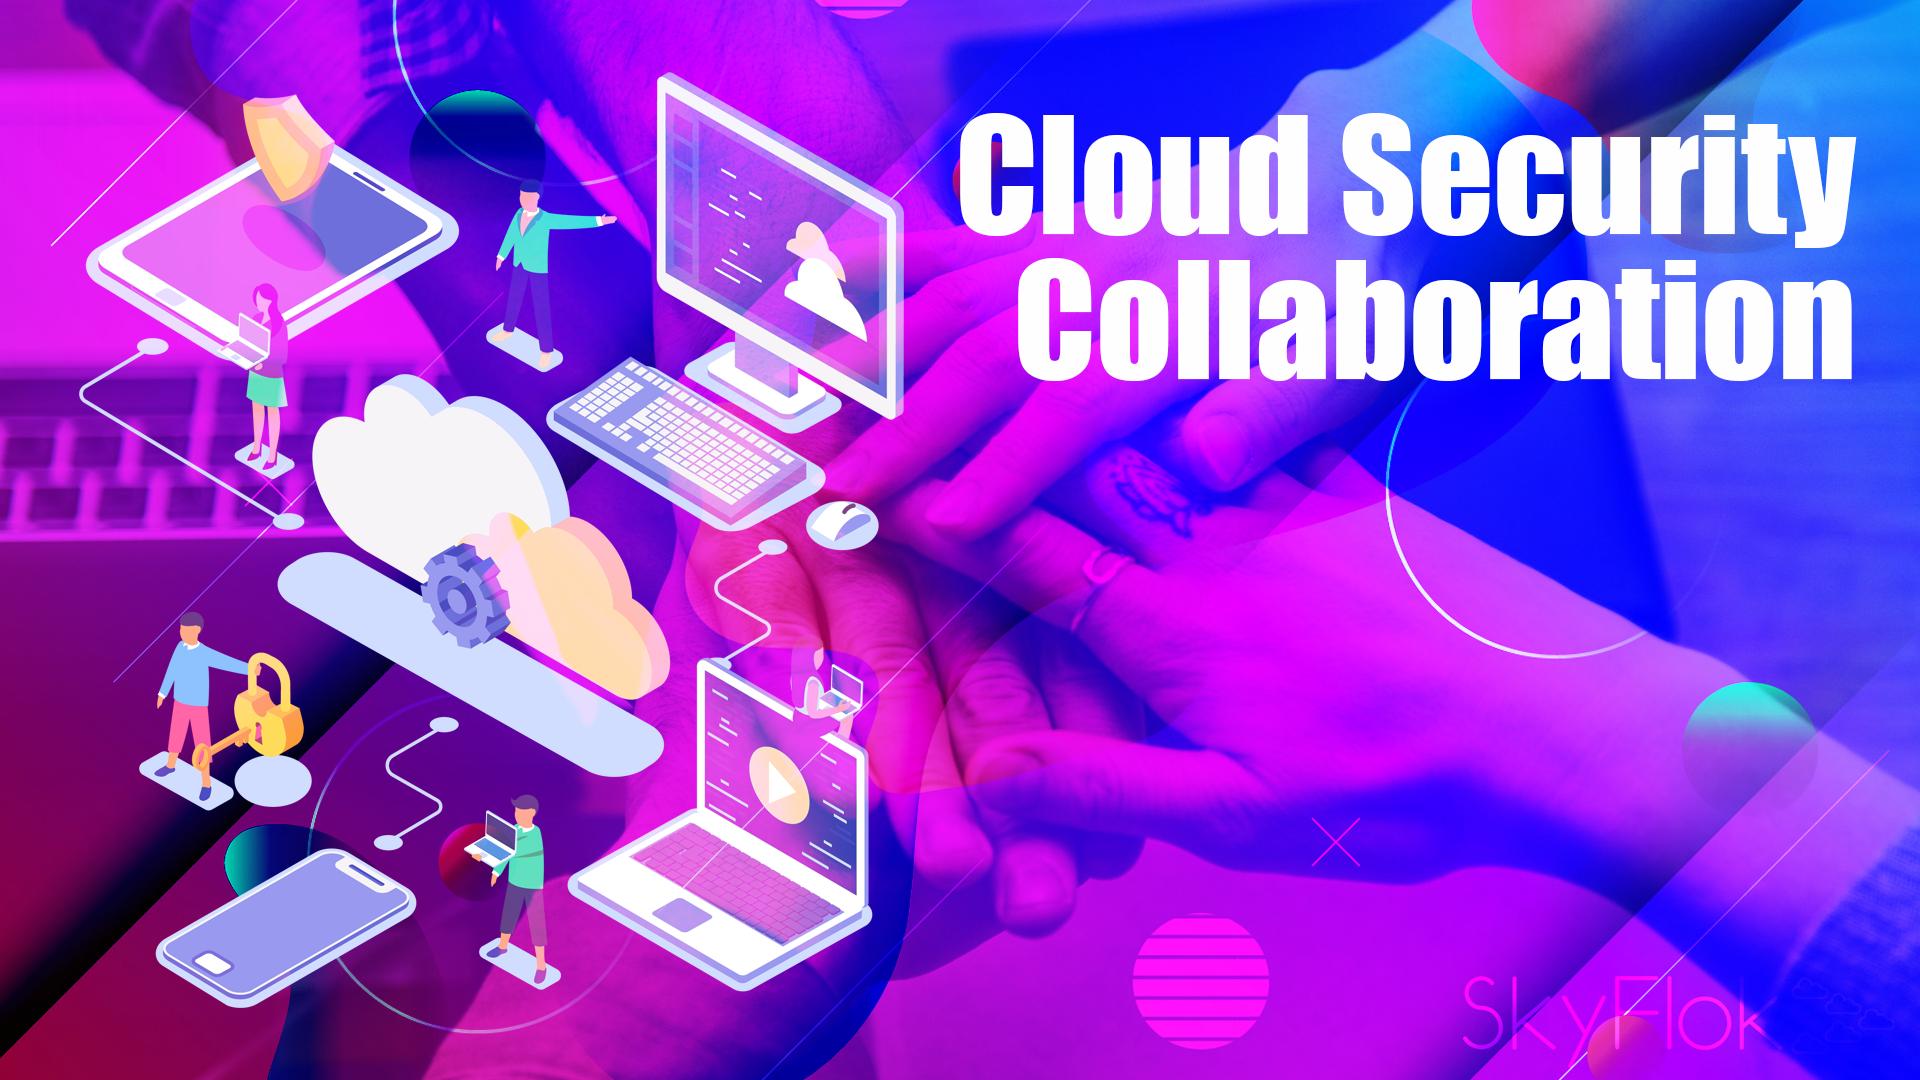 Cloud Security Collaboration